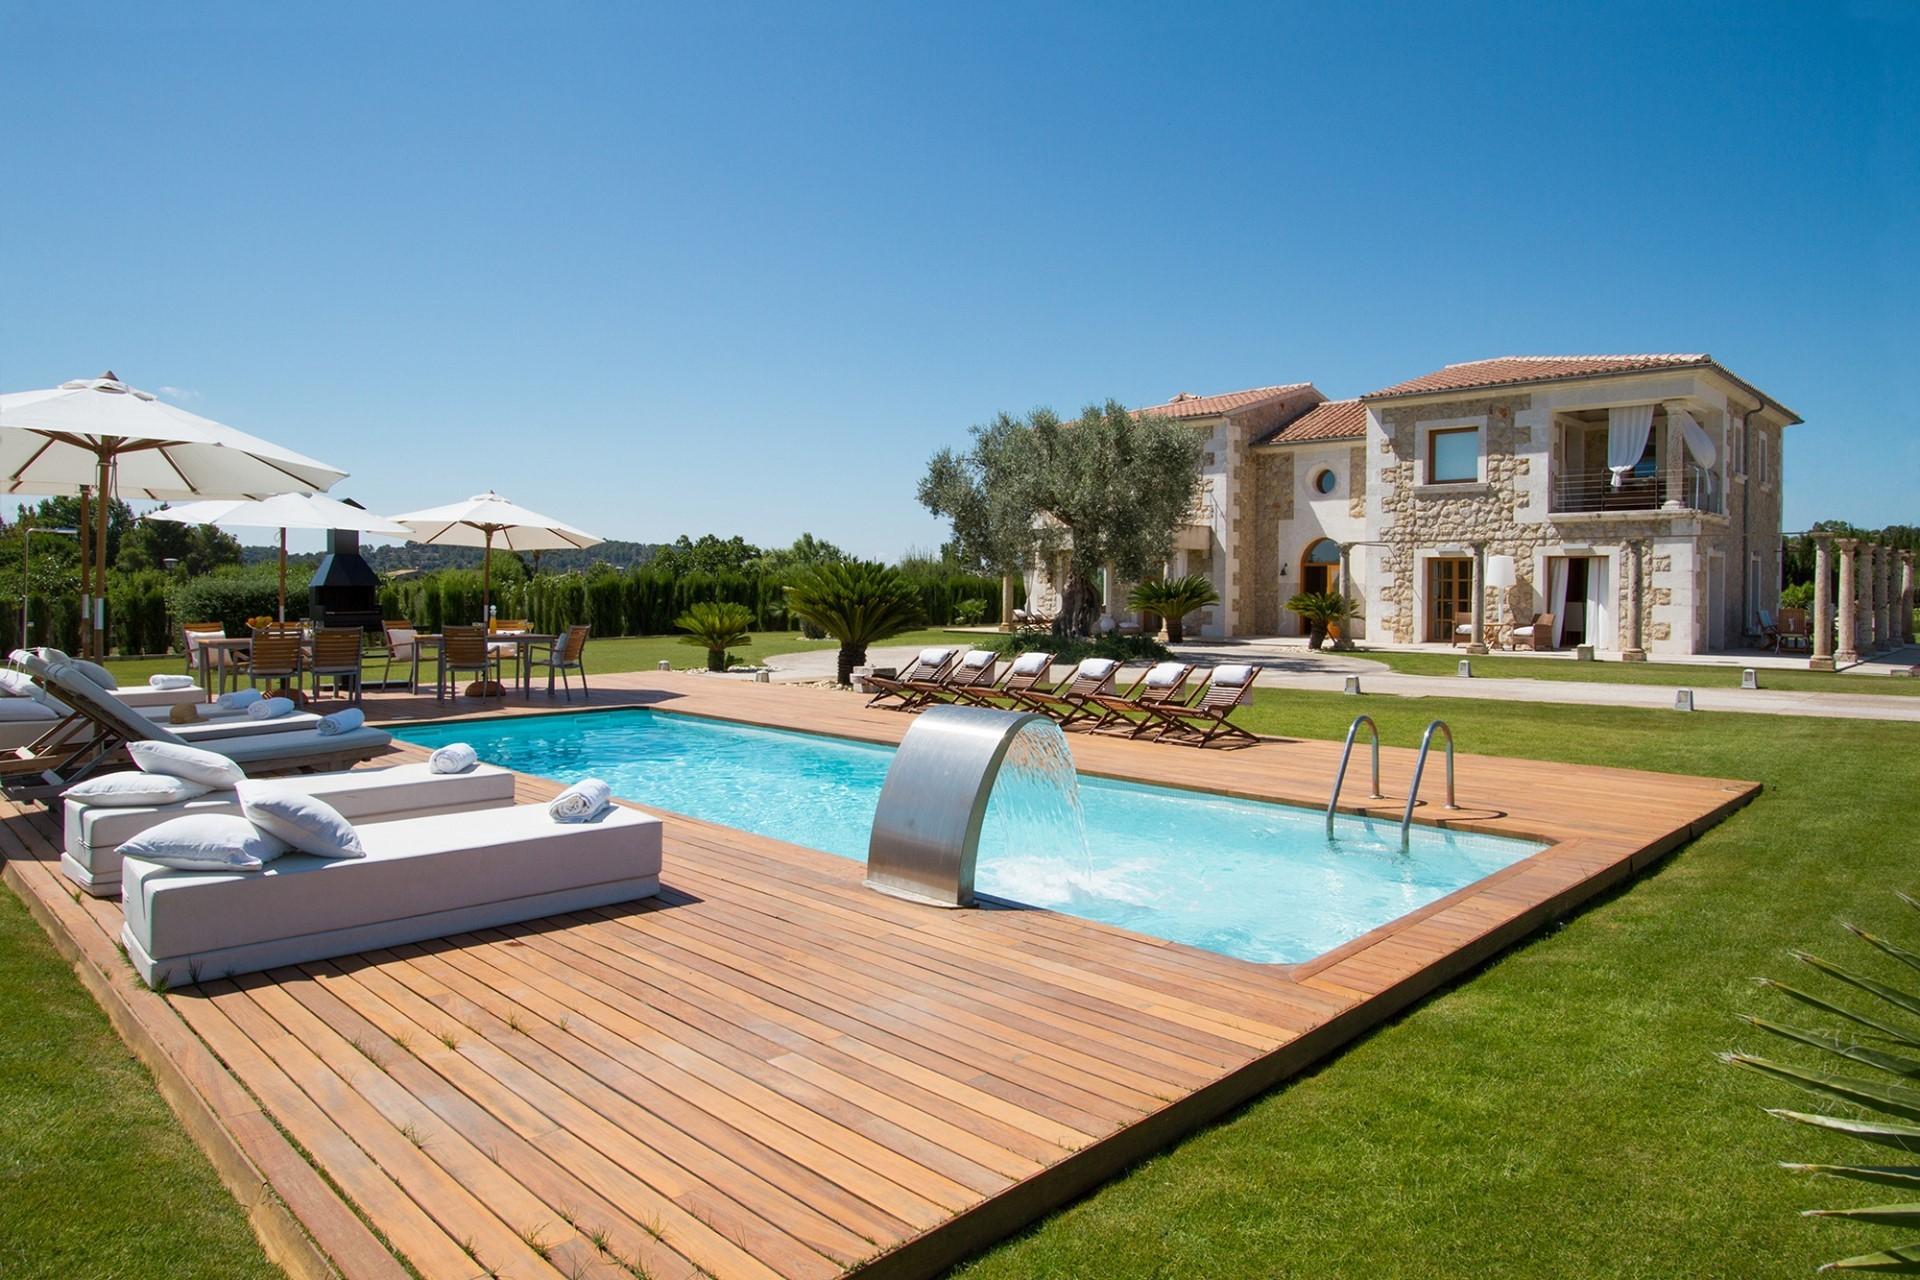 Majorca Villa with a pool